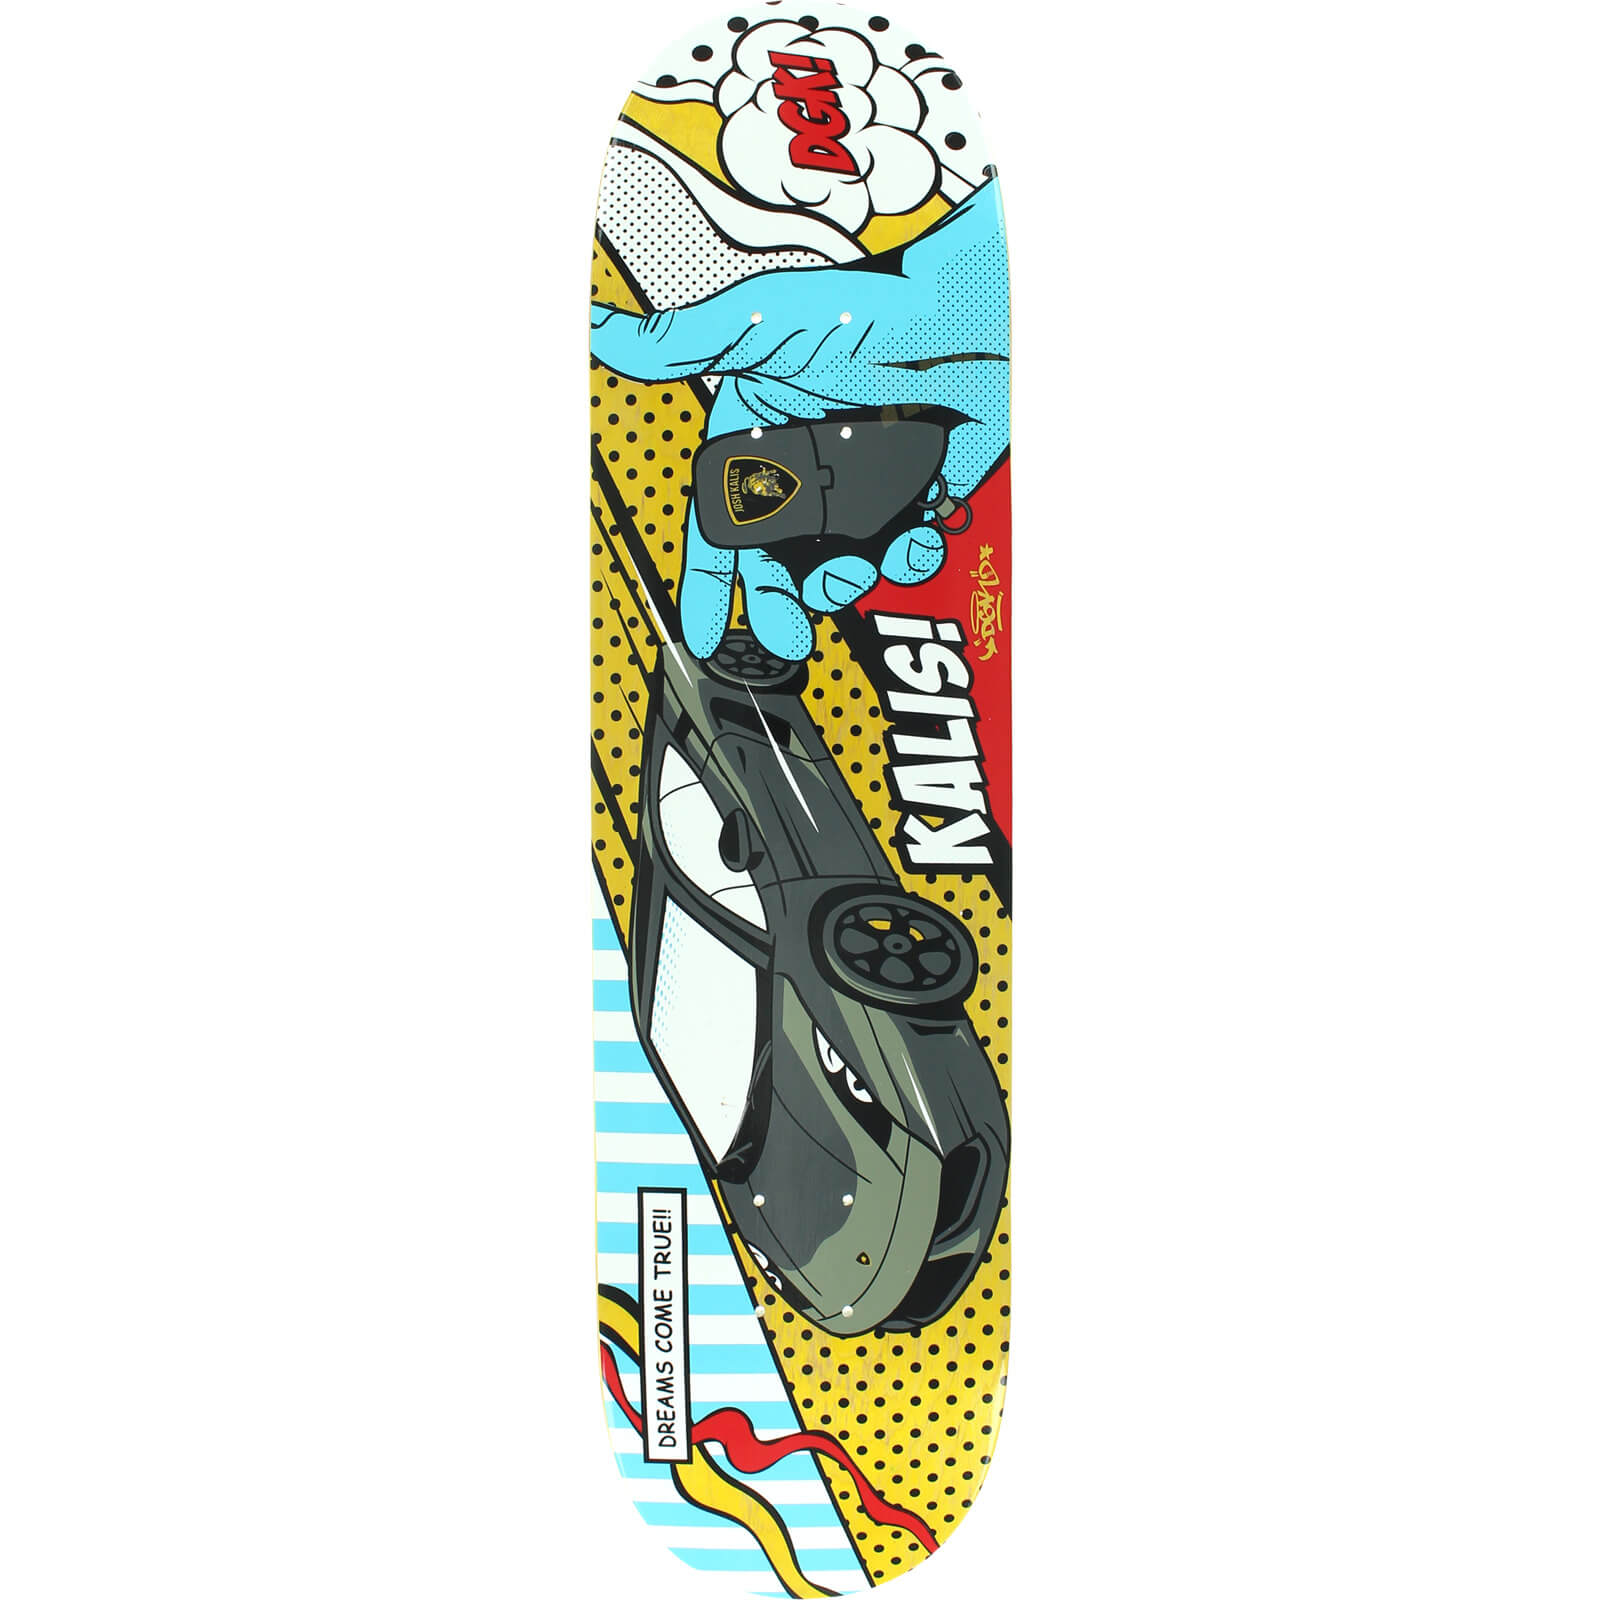 Dgk Skateboards Josh Kalis Life Of Skateboard Deck 7 8 X